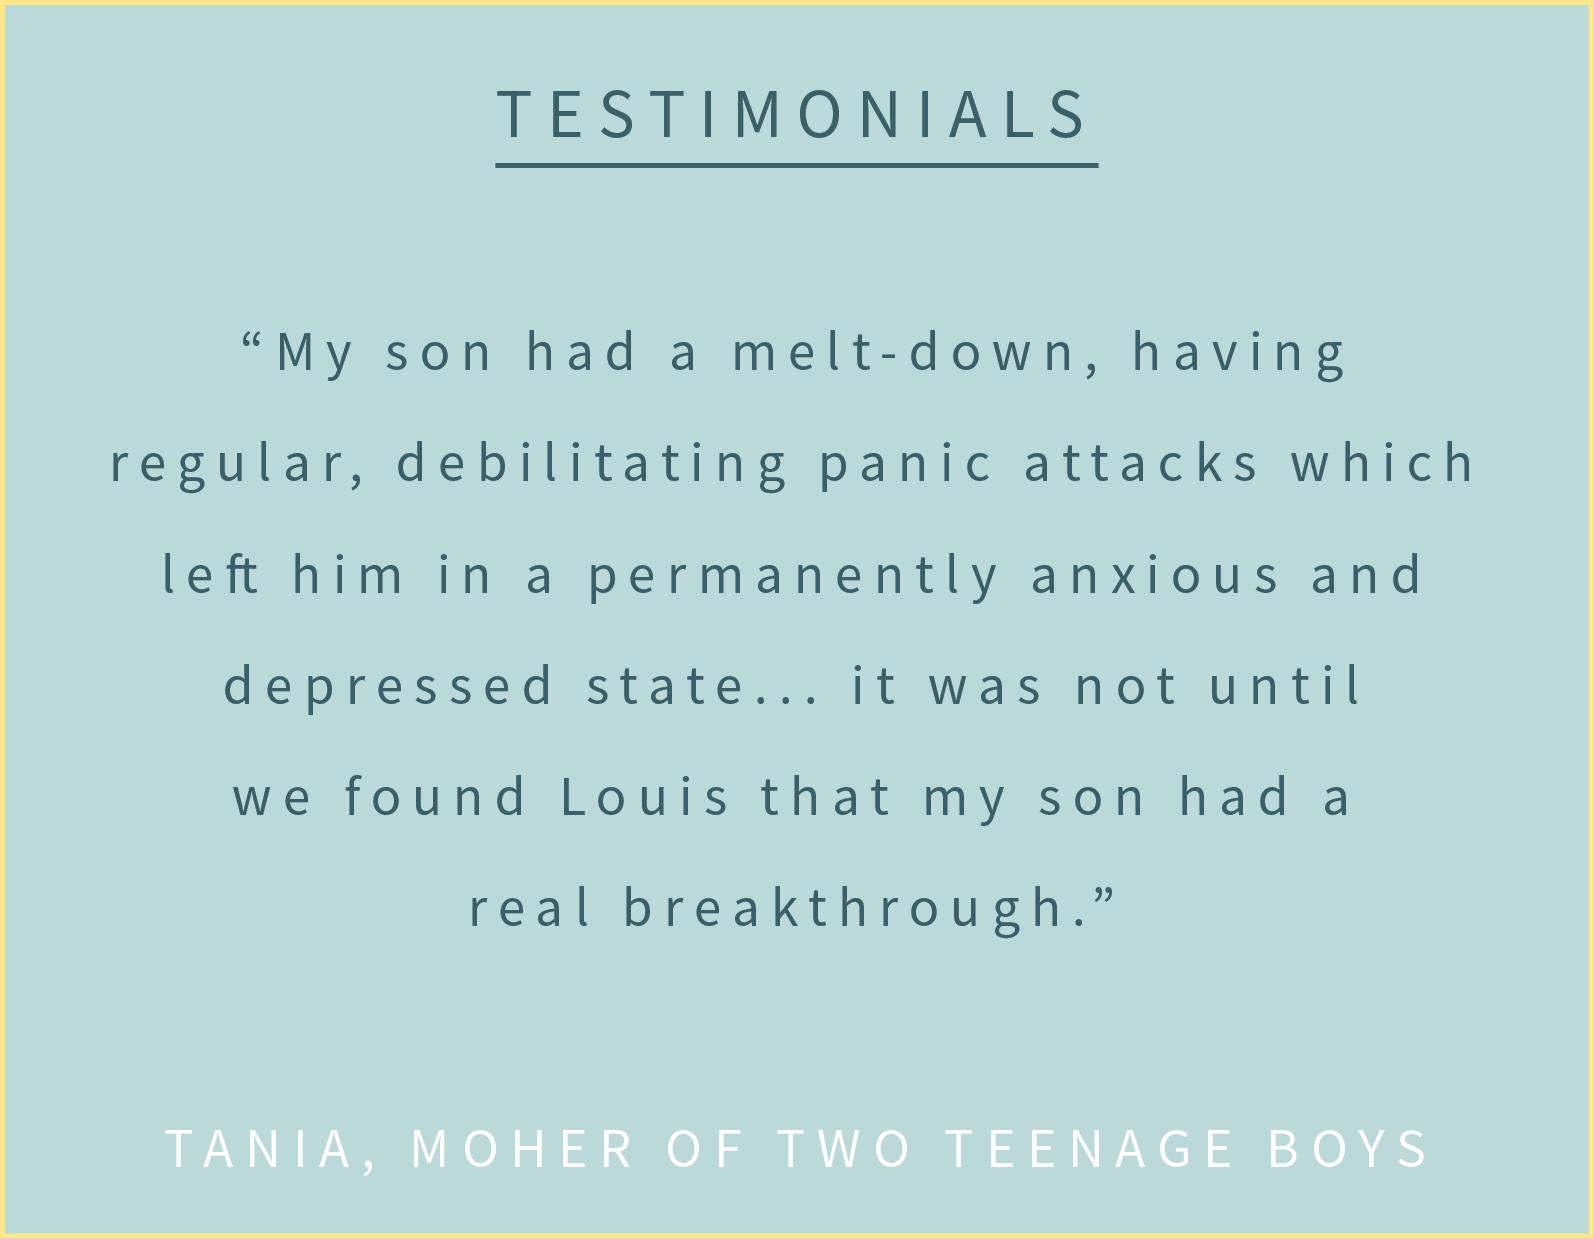 Testimonials Home5-01.png